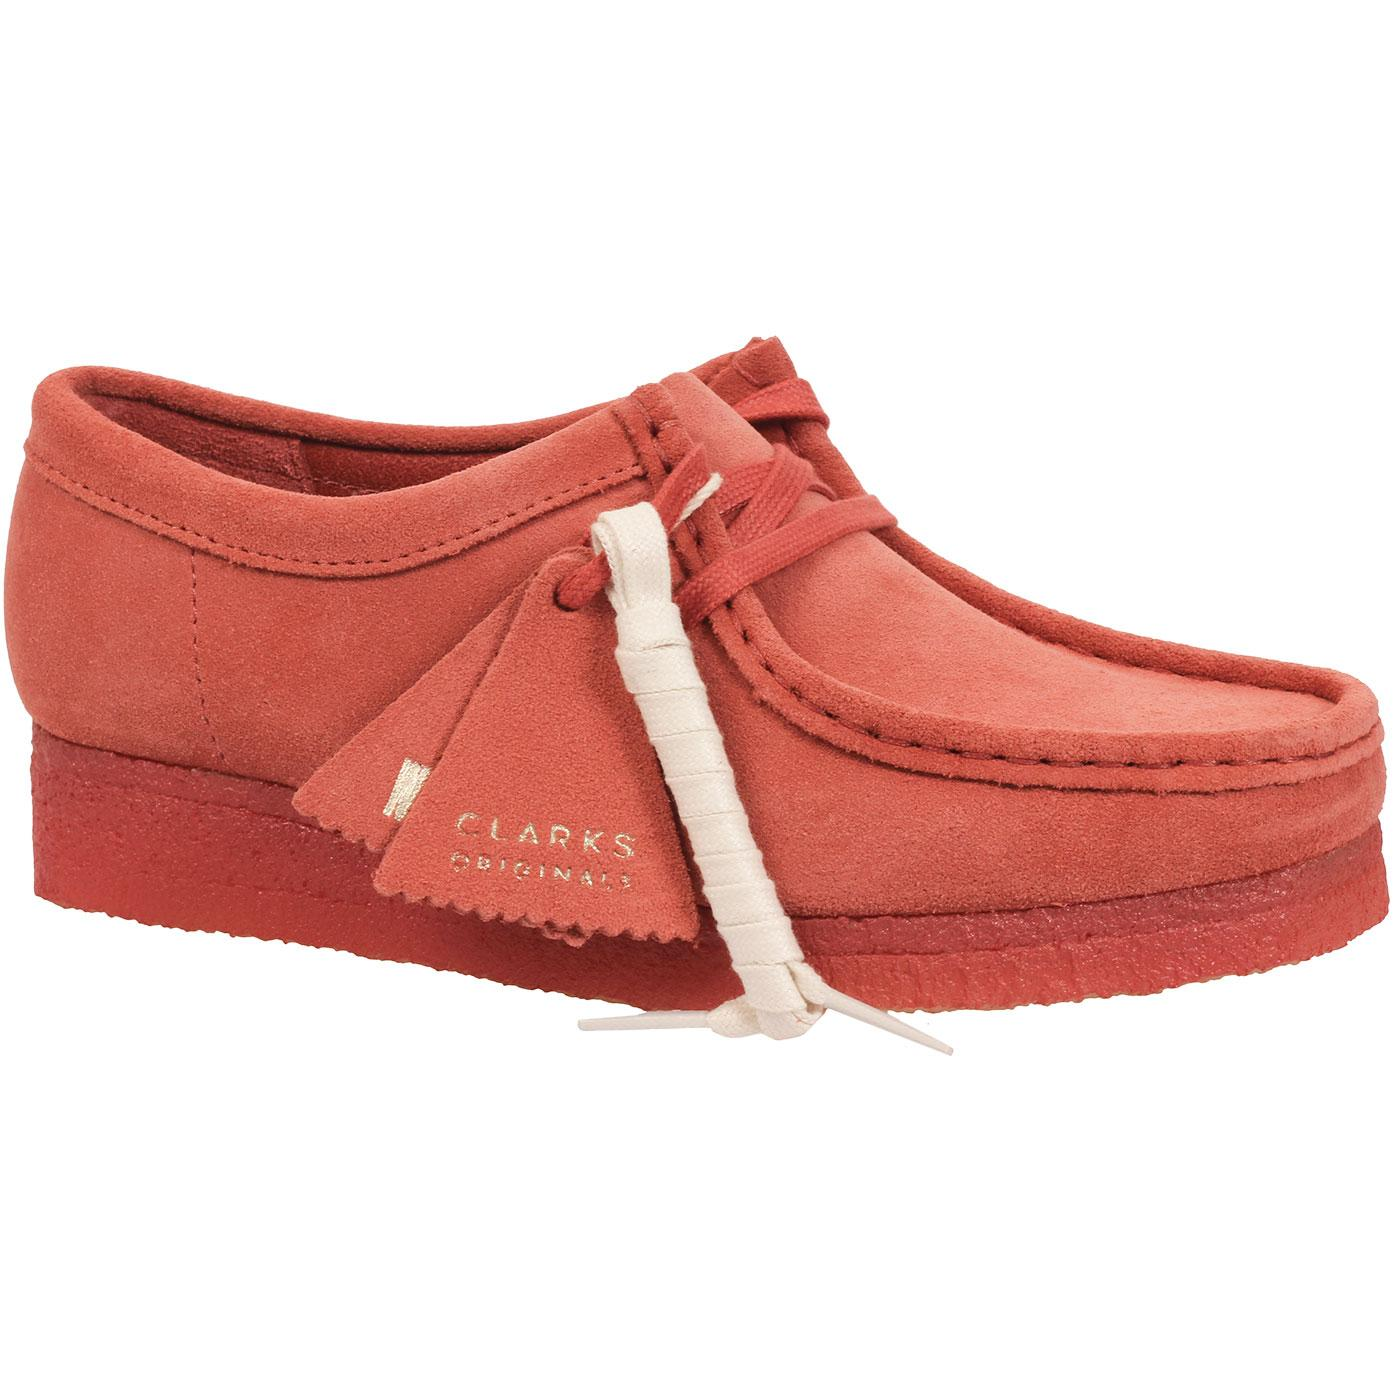 Wallabee Suede CLARKS ORIGINALS Womens Shoes DB